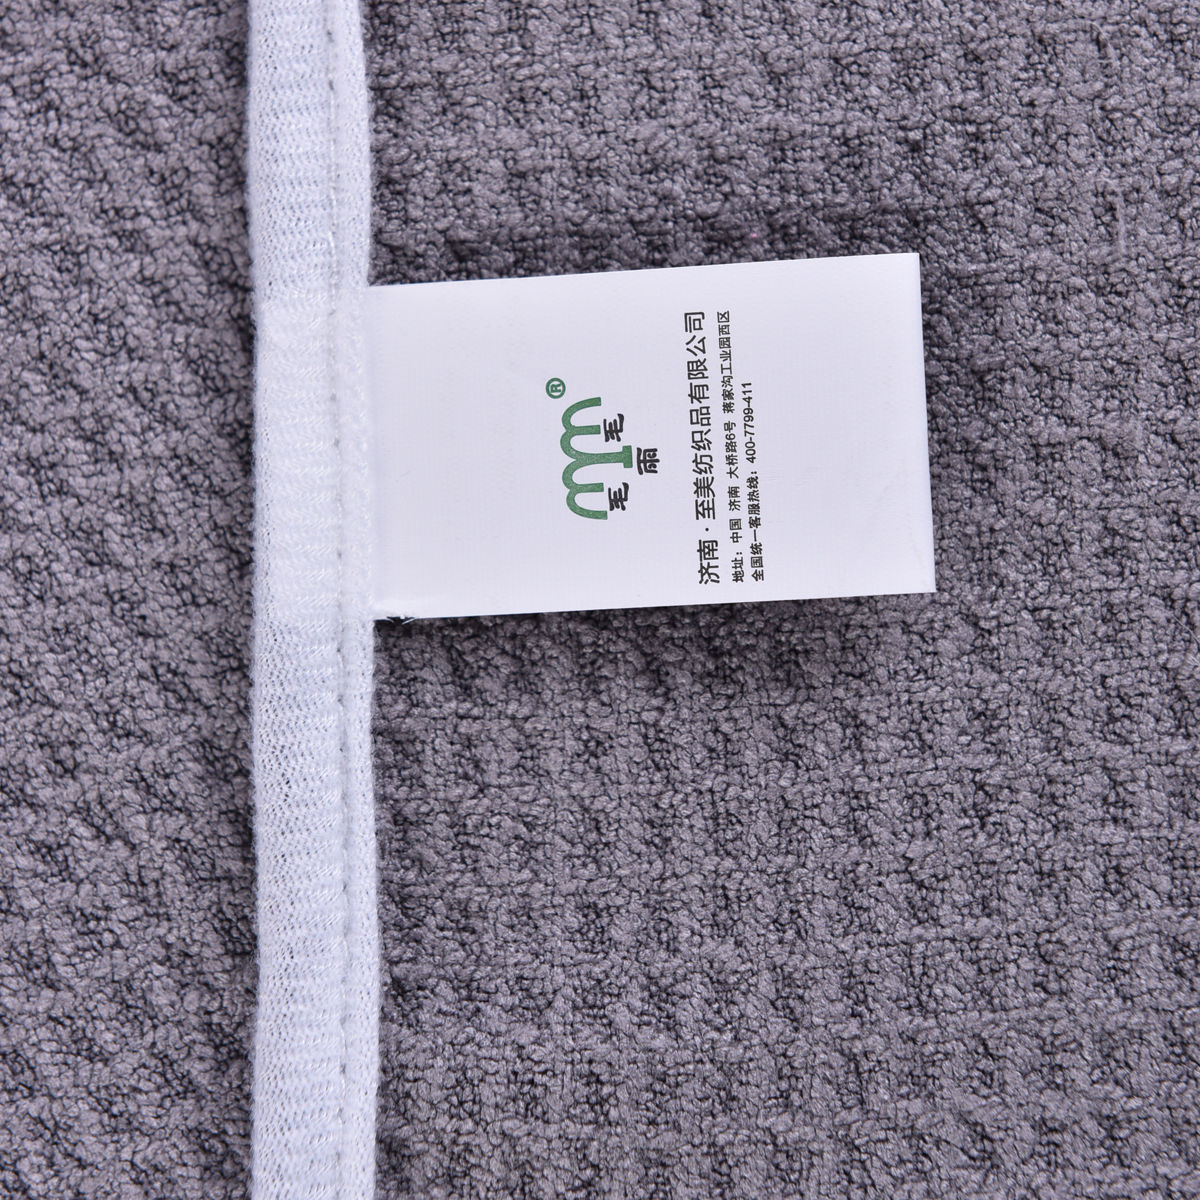 Microfiber Gym Towel With Zip: 2PC Fitness Towels Golf Zipper Pocket Workout GYM Towel